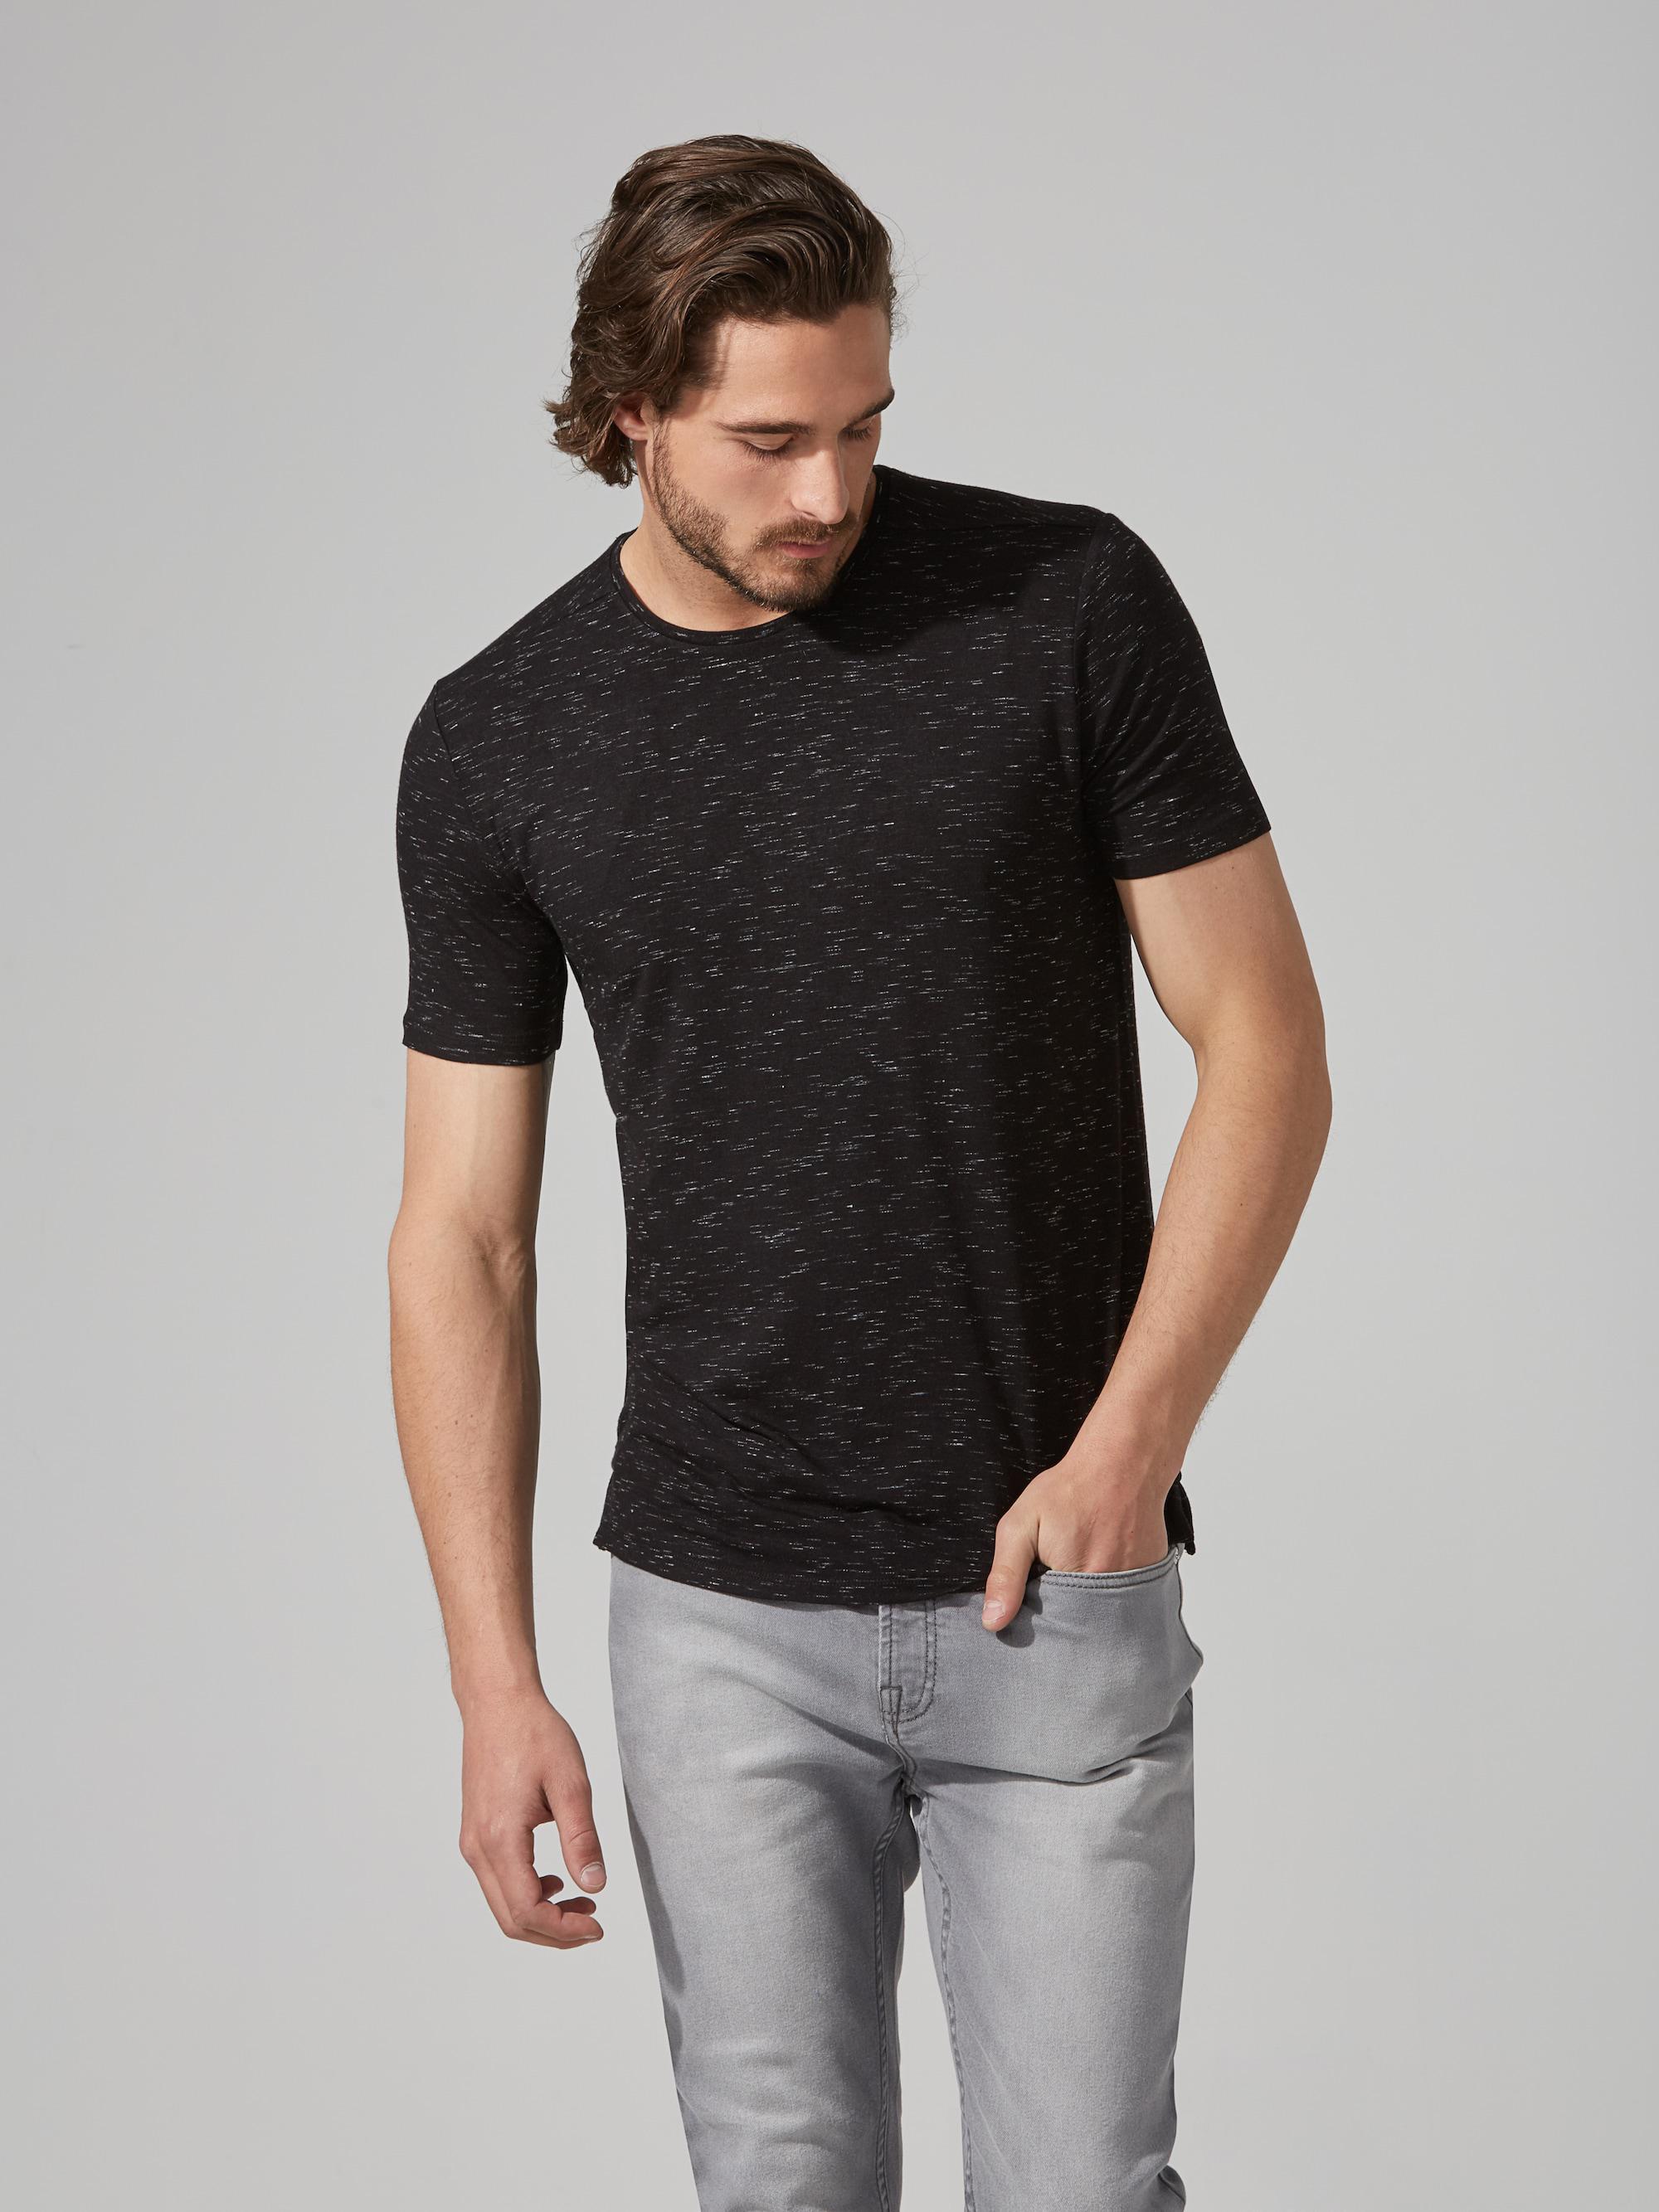 6414479932 Lyst - Frank And Oak Loose Fit Jersey T-shirt In Black Melange in ...